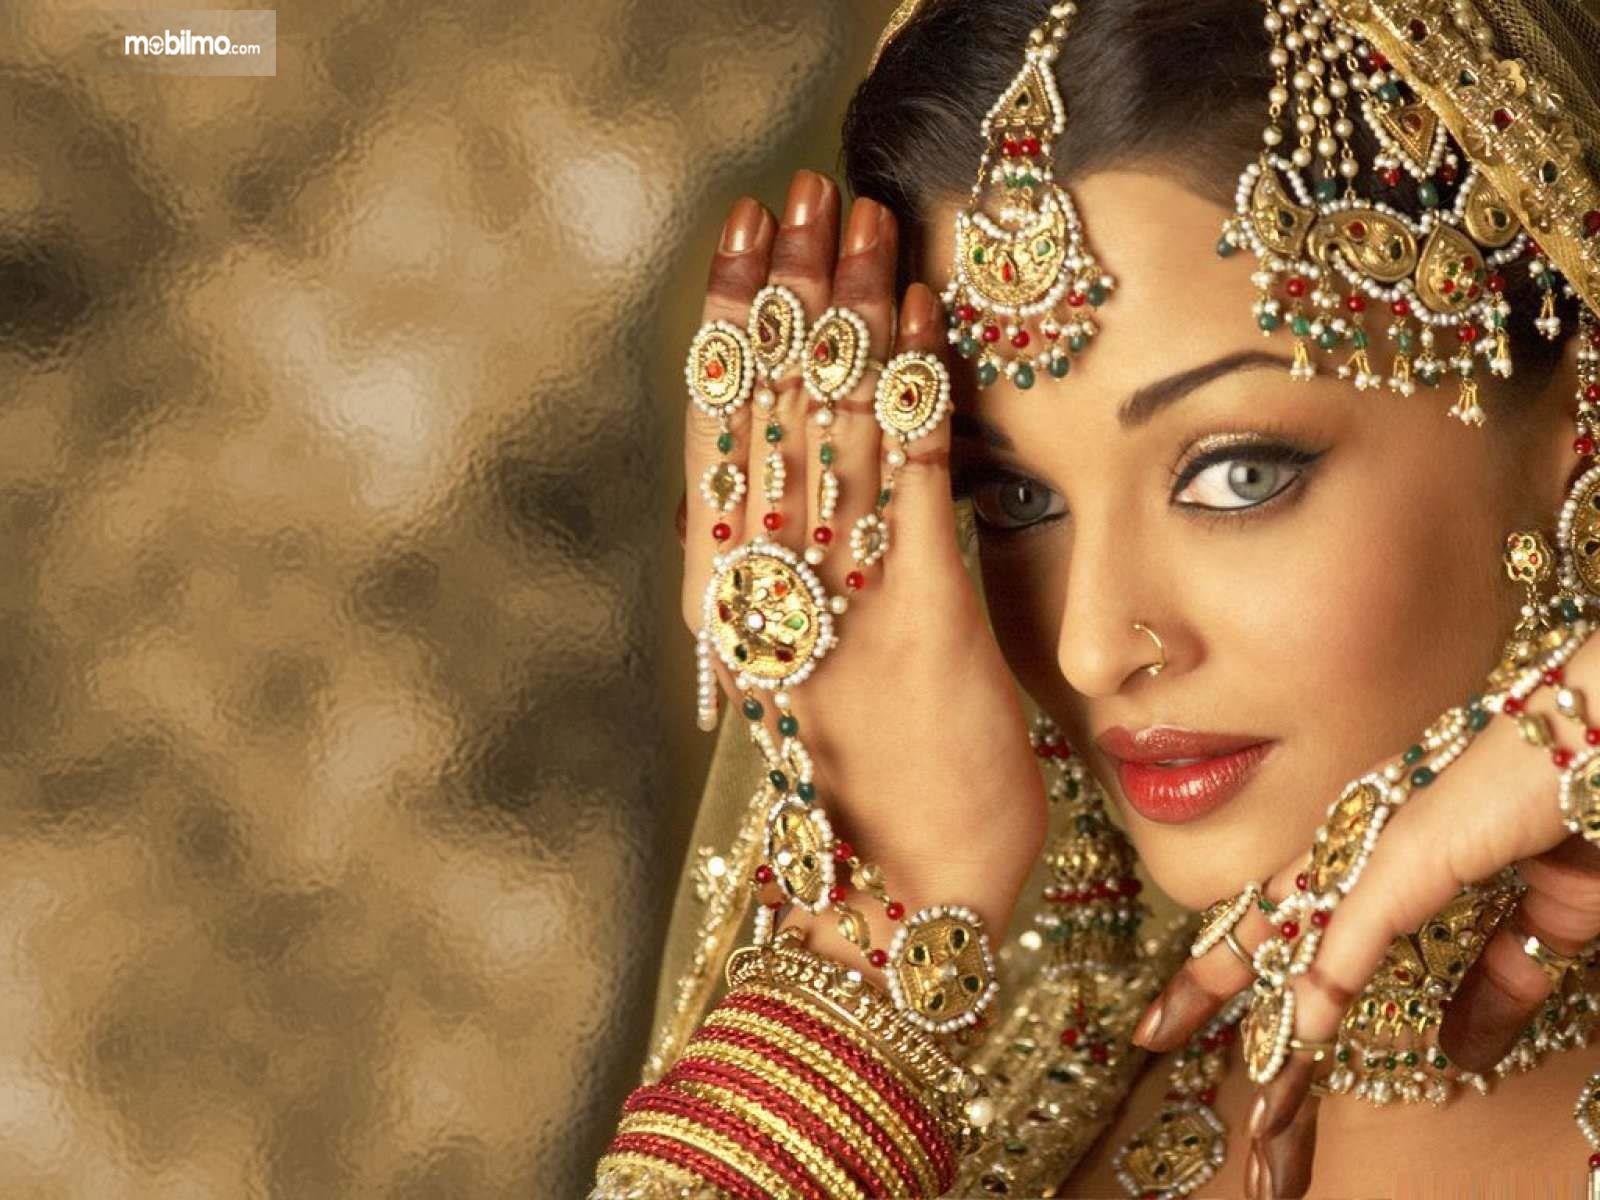 Foto artis India pakai perhiasan berlebihan dan mencolok